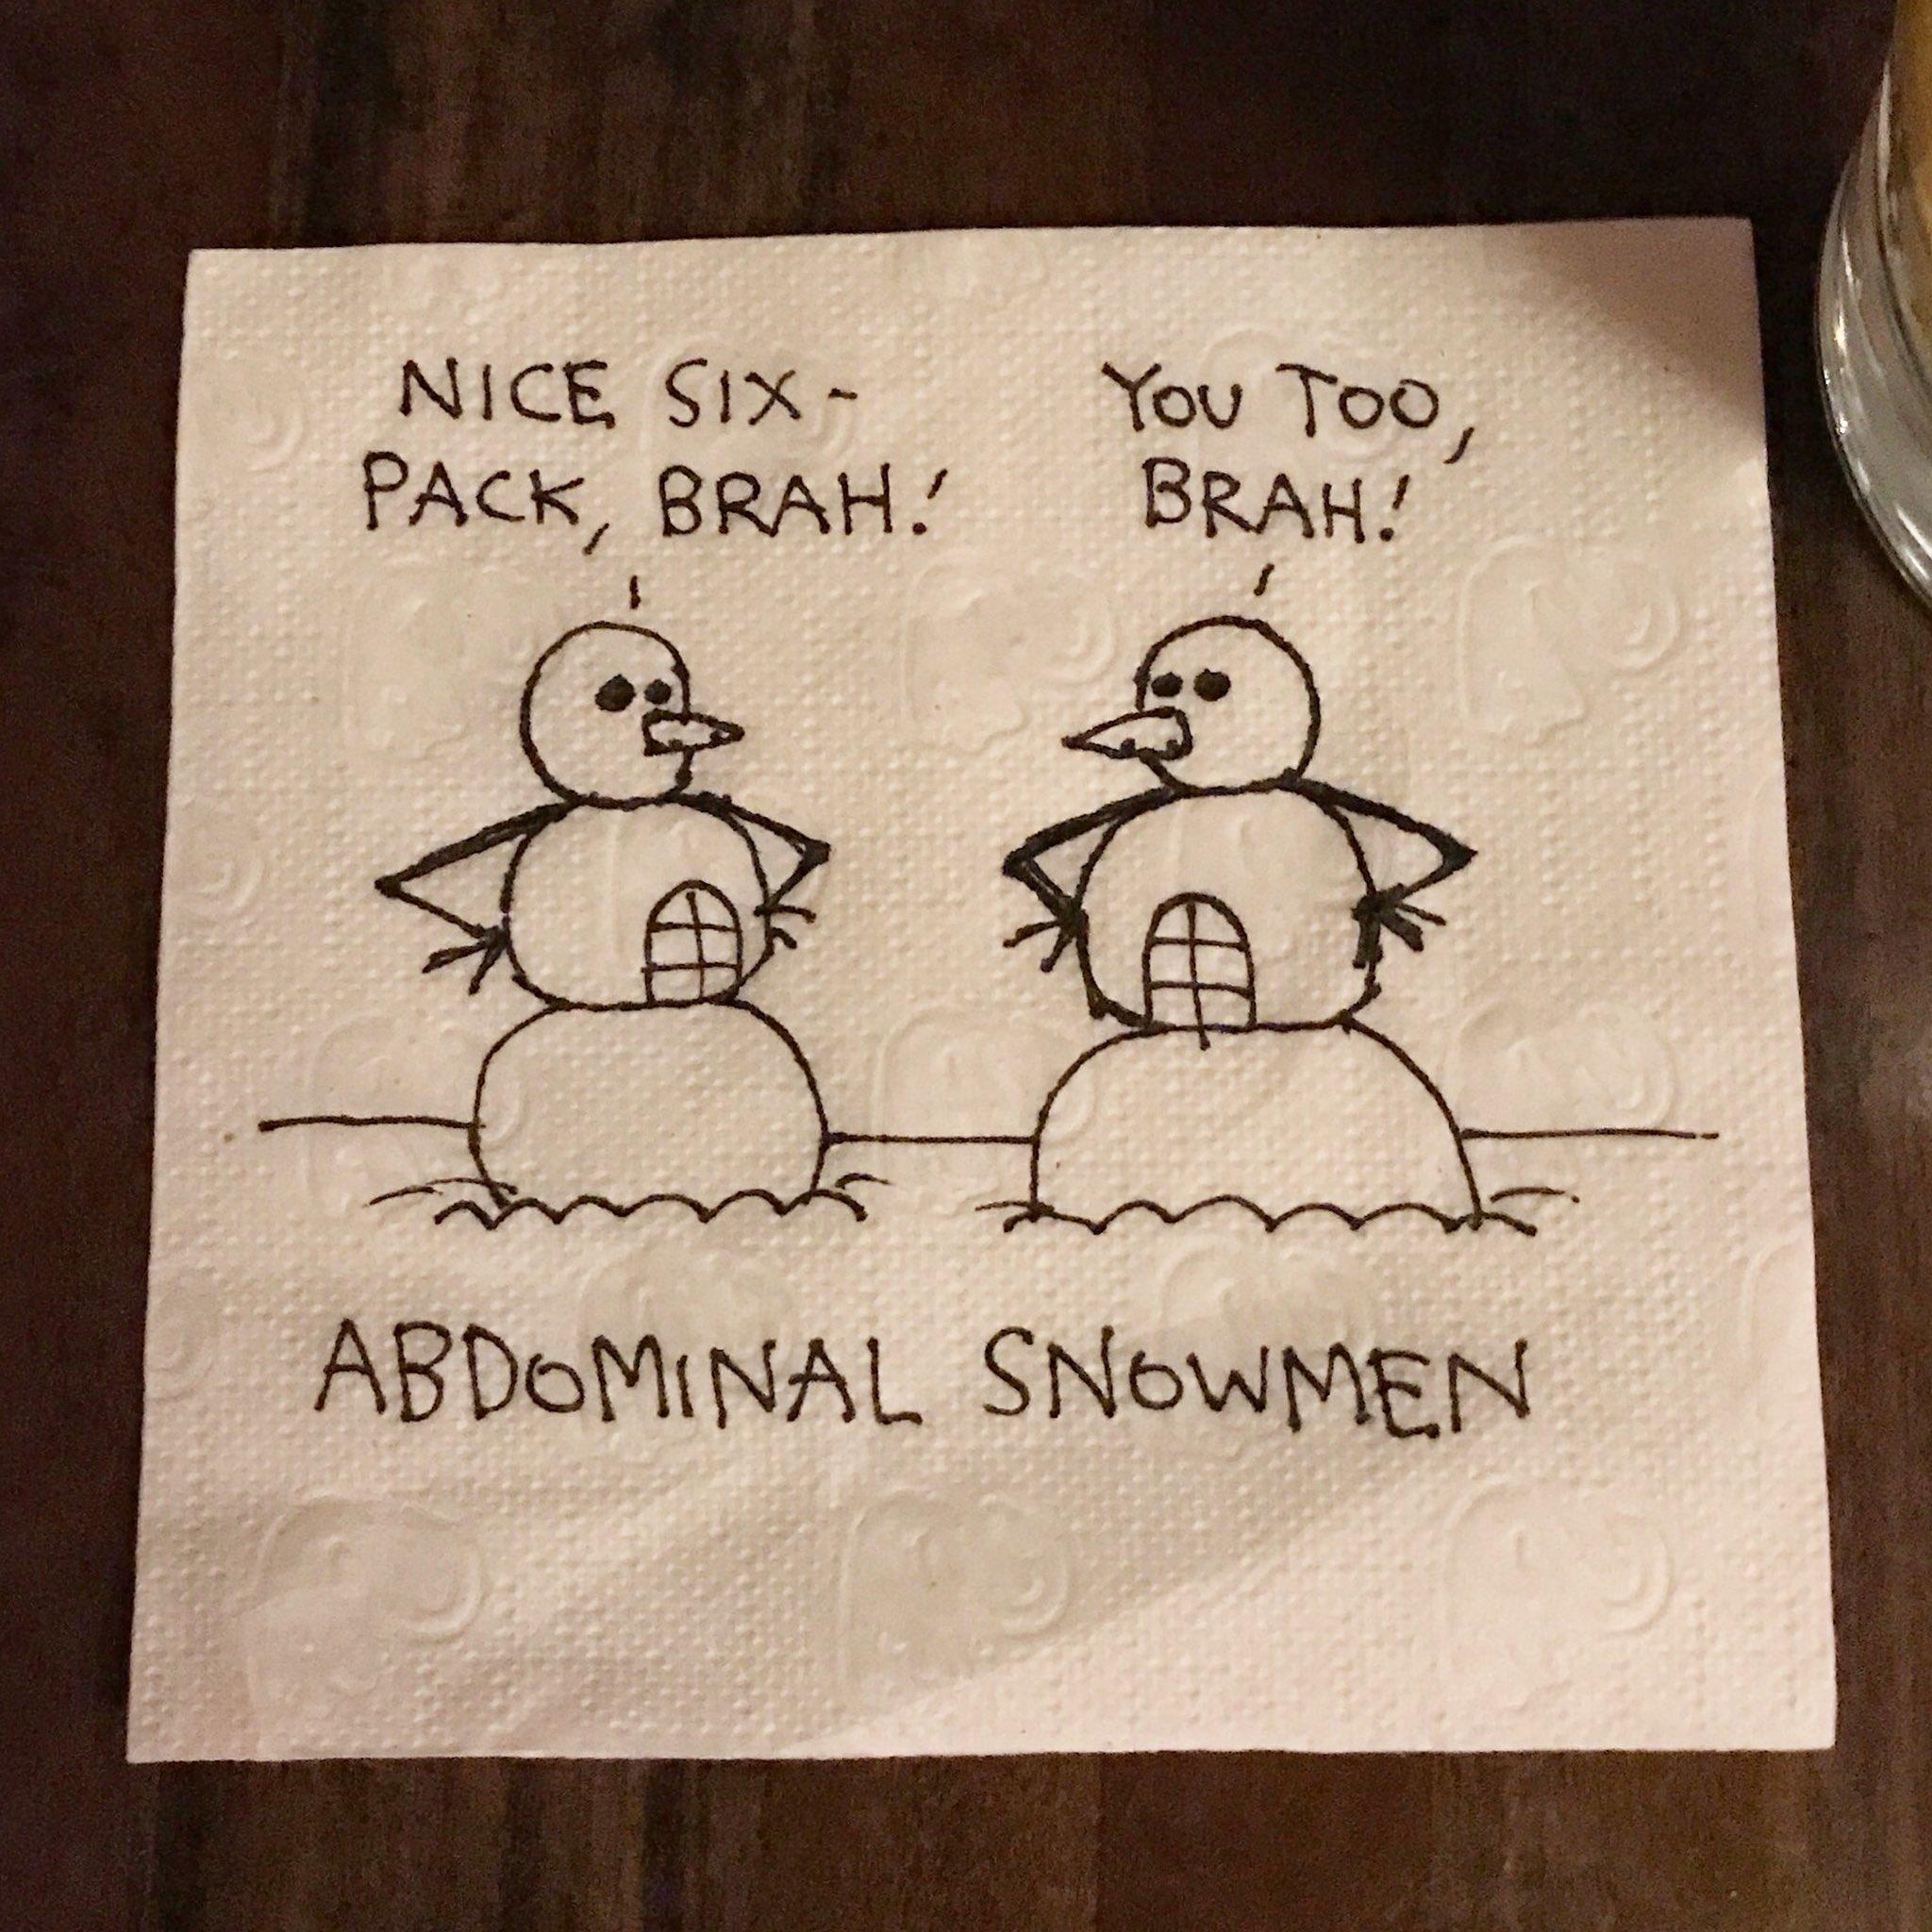 Tonight's dumb napkin cartoon... https://t.co/aEhVYKgnCJ https://t.co/cQmjSxDpIn